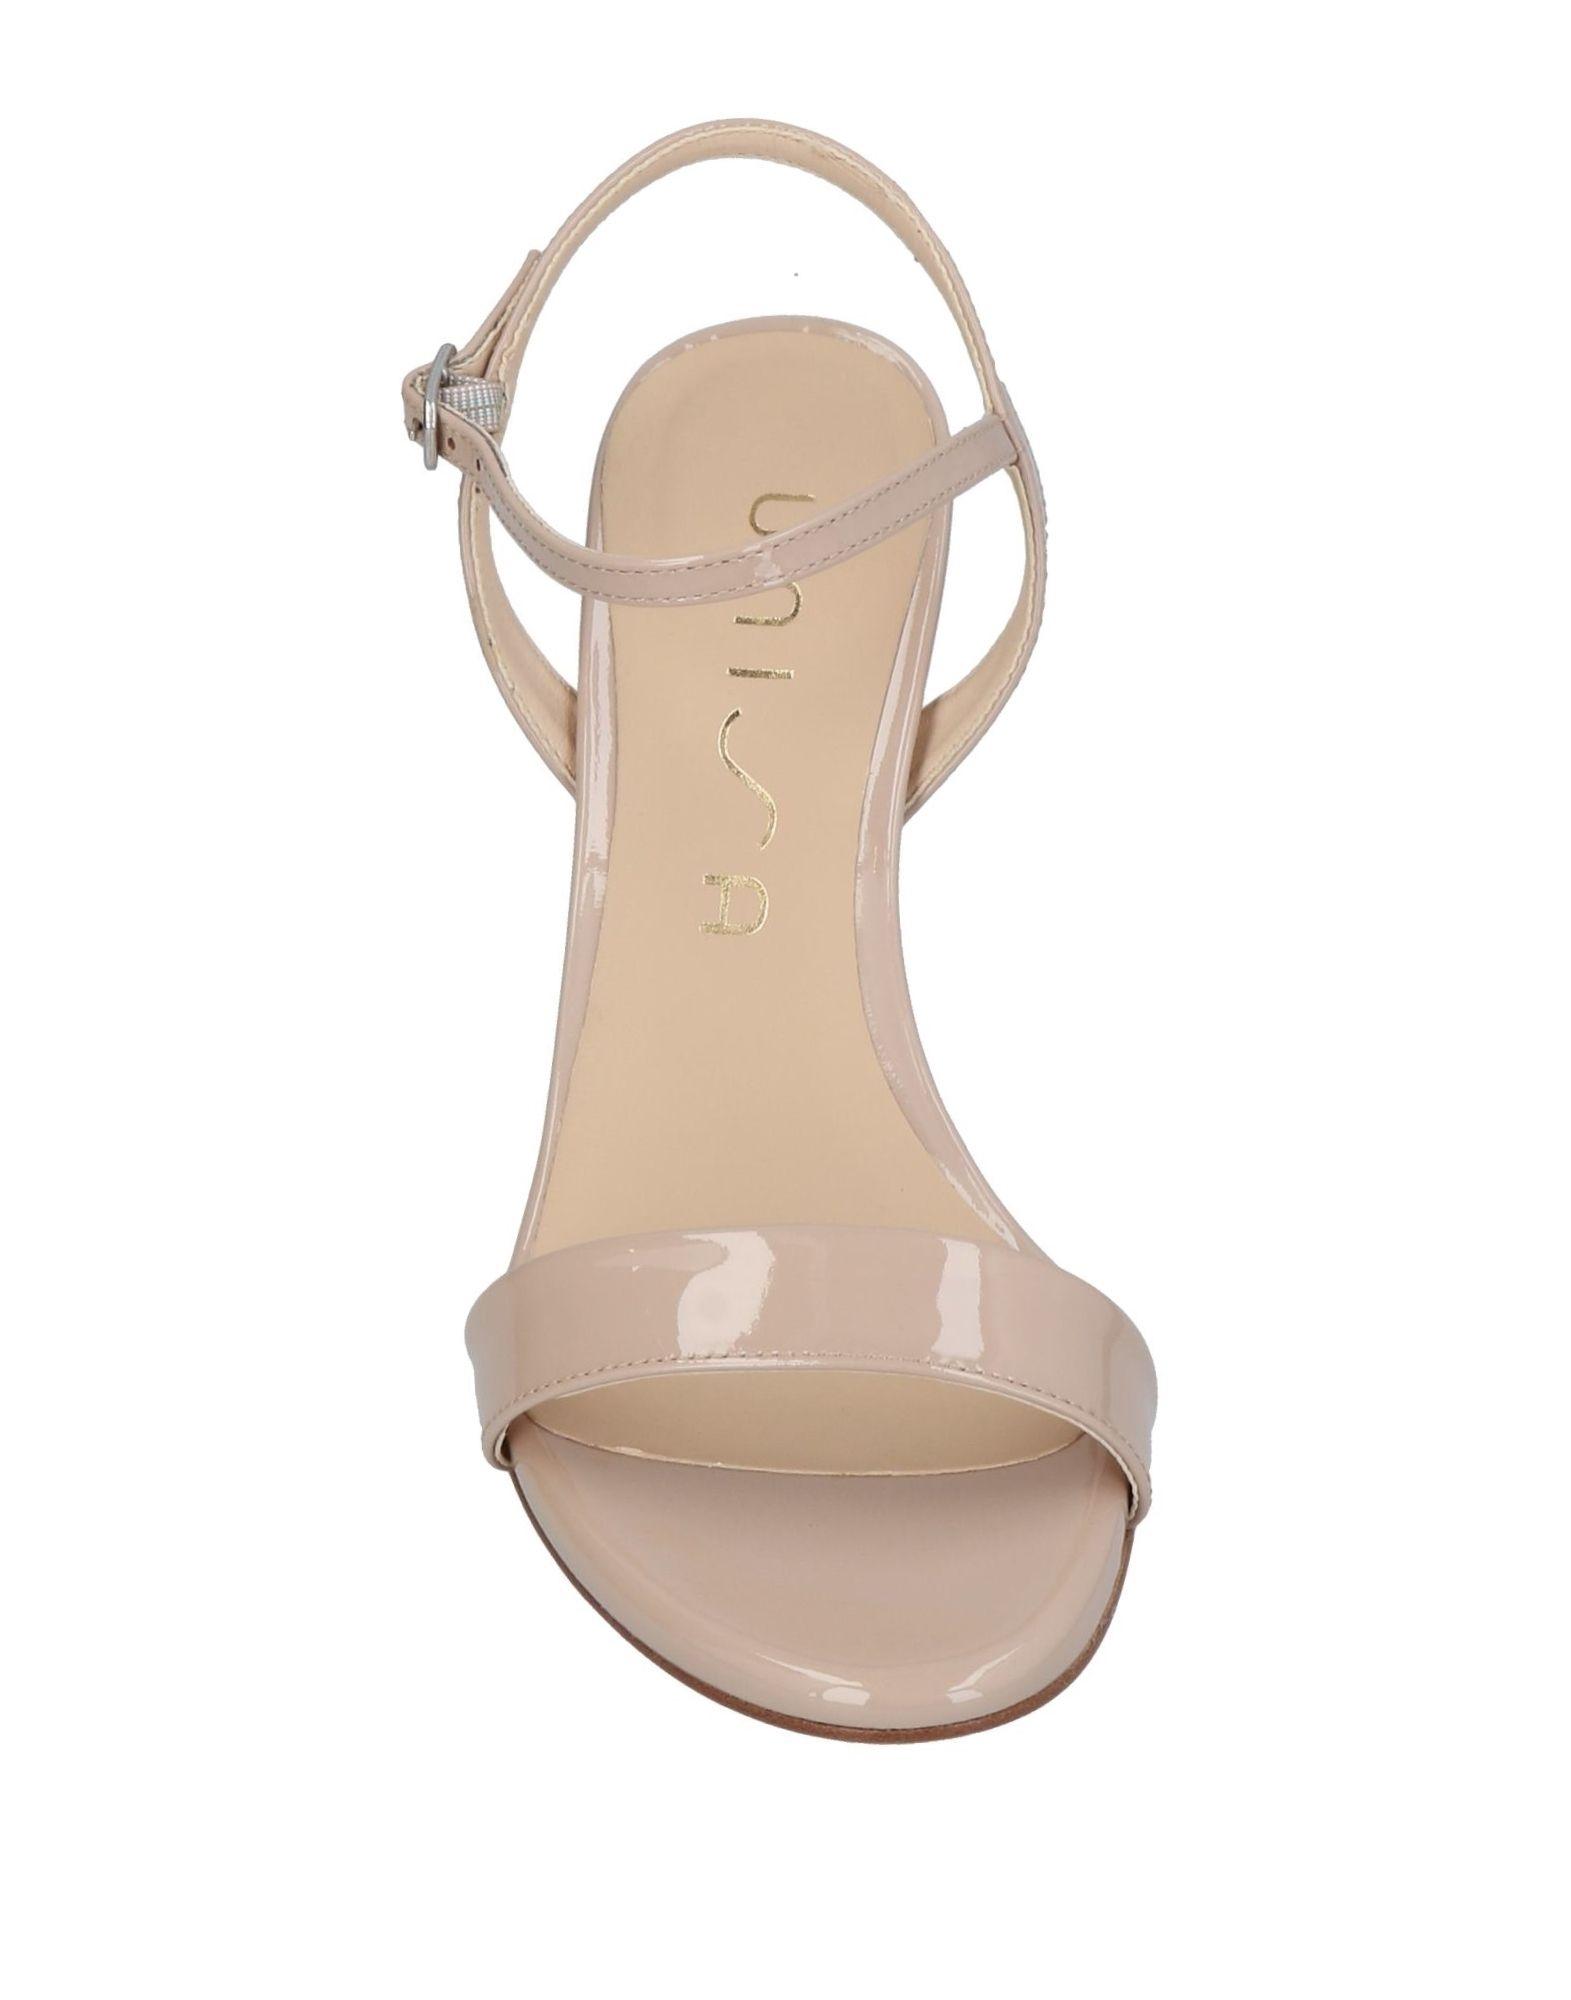 Sandales Unisa Femme - Sandales Unisa sur